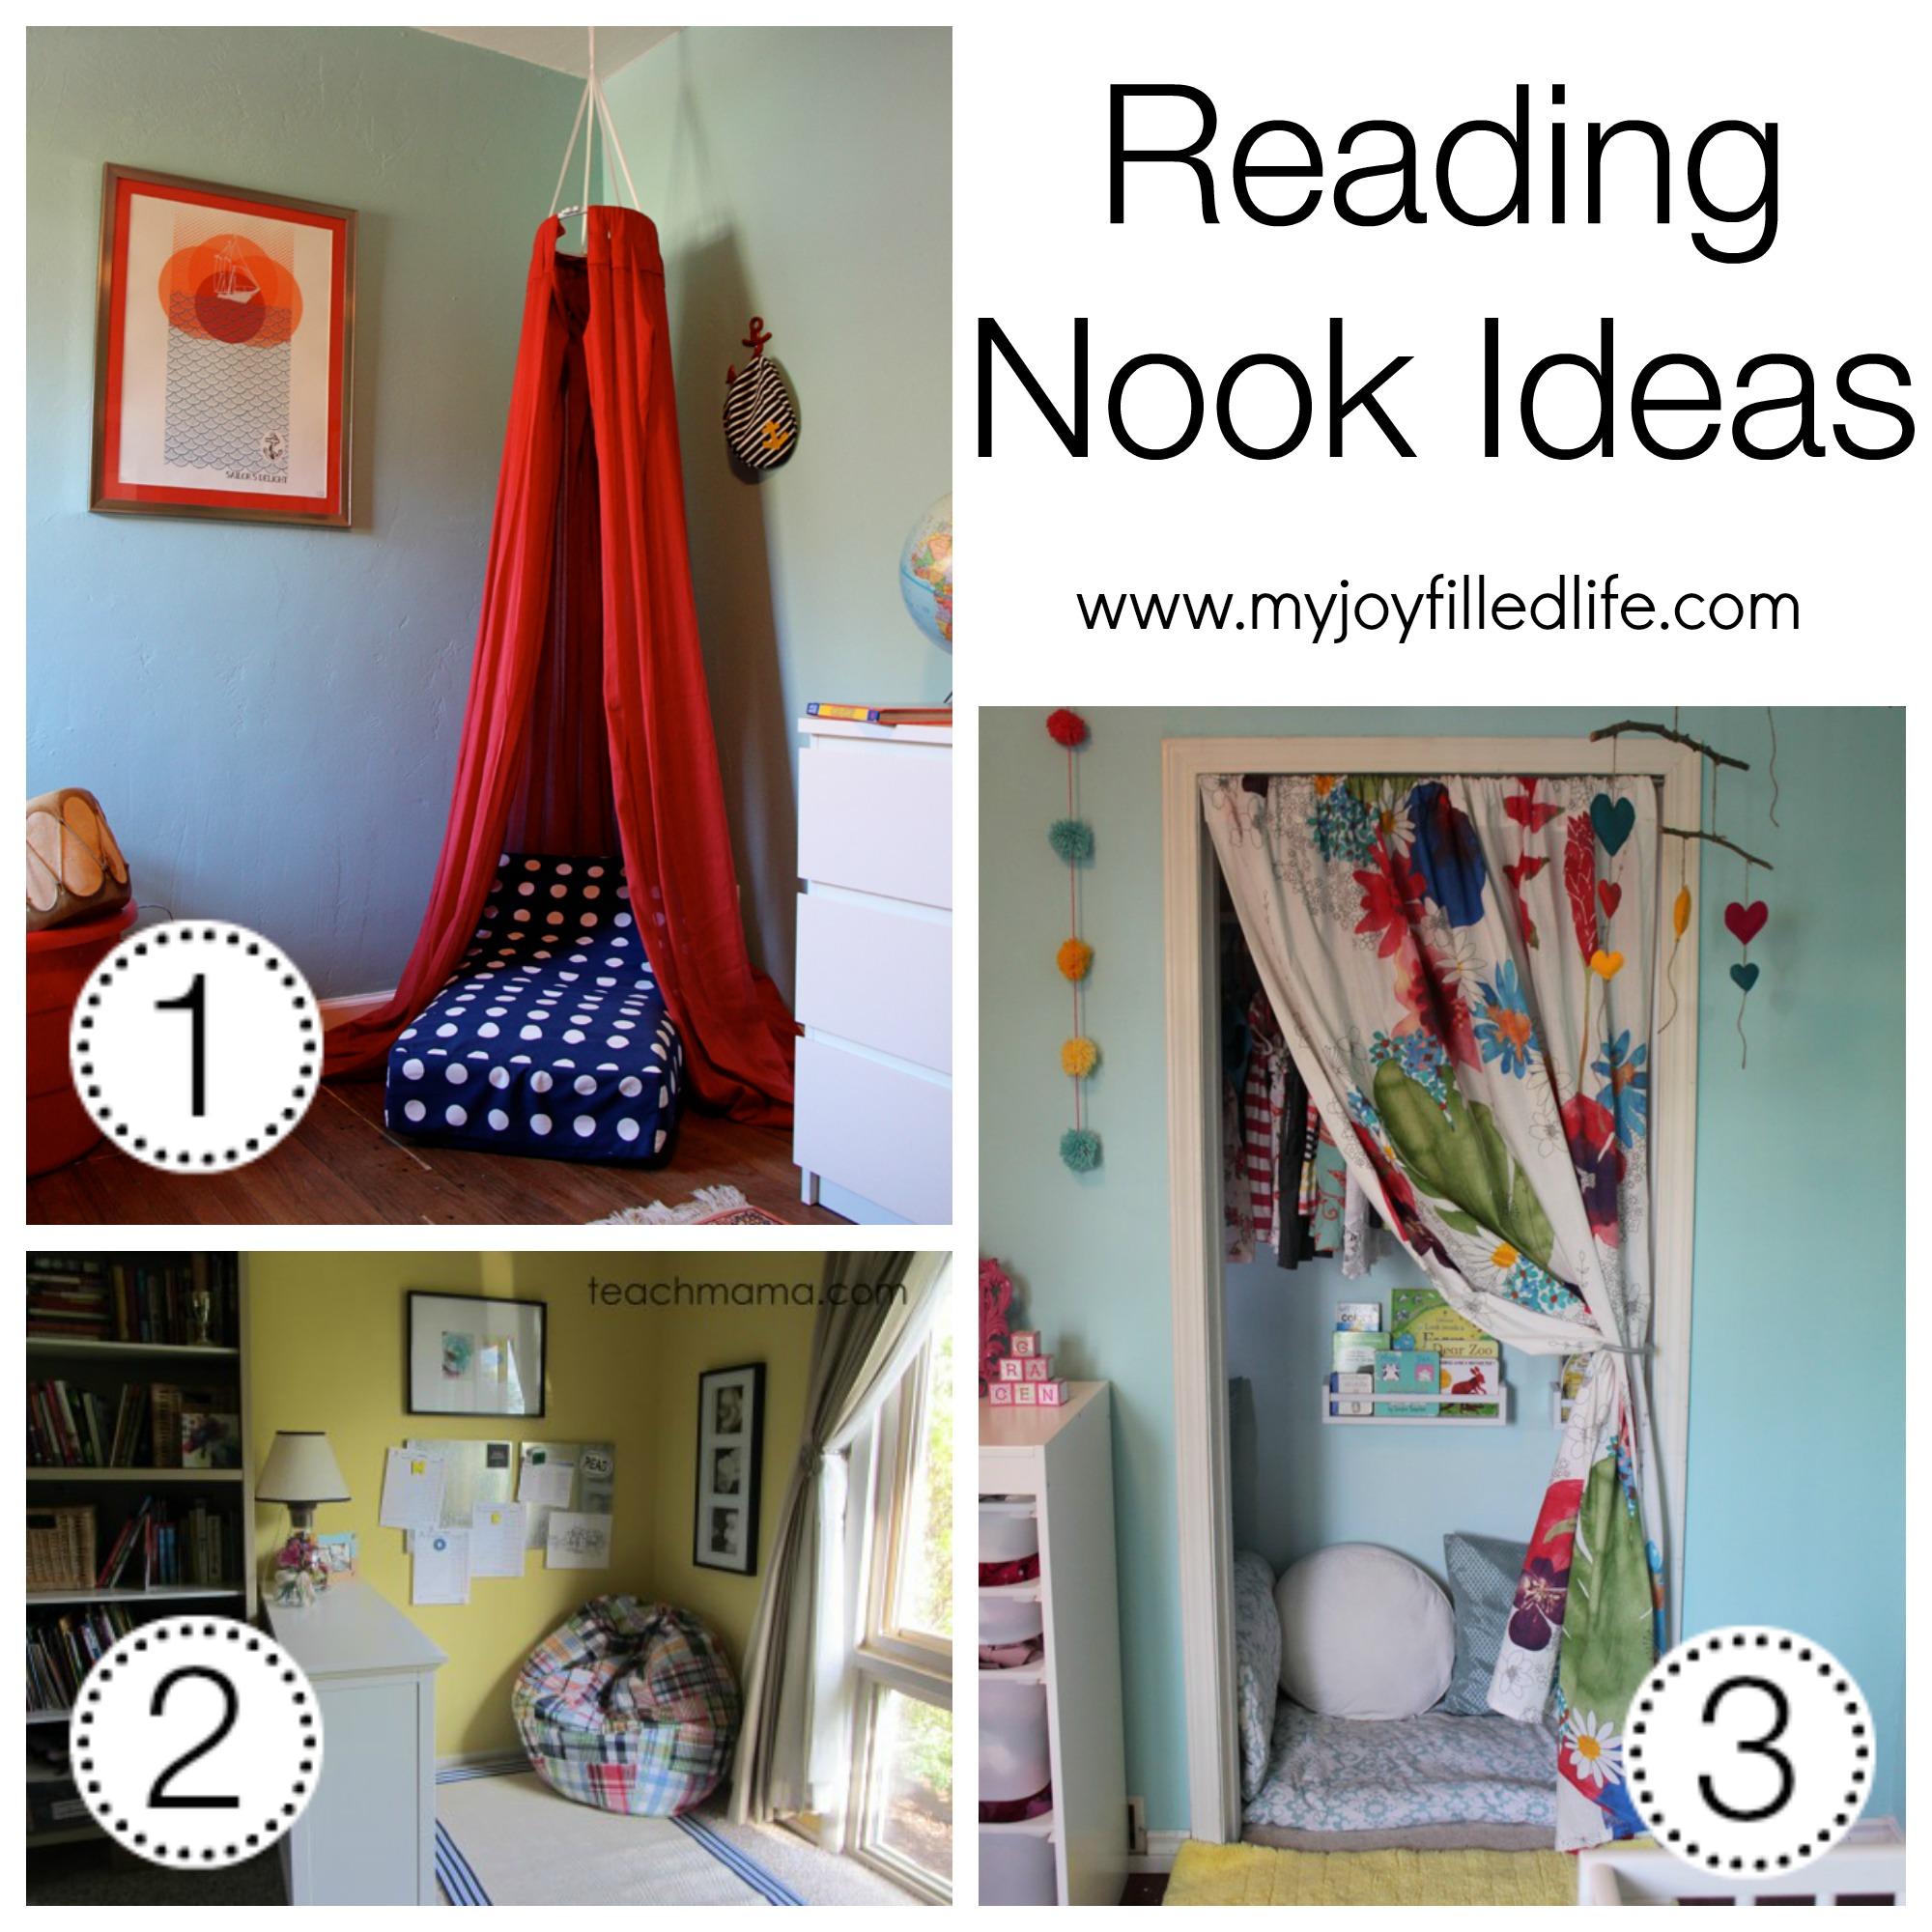 Idyllic More Ideas Ideas Your Homeschool Room Or Space My Life Homeschool Room Ideas Pinterest Homeschool Room Ideas Ikea houzz 01 Homeschool Room Ideas